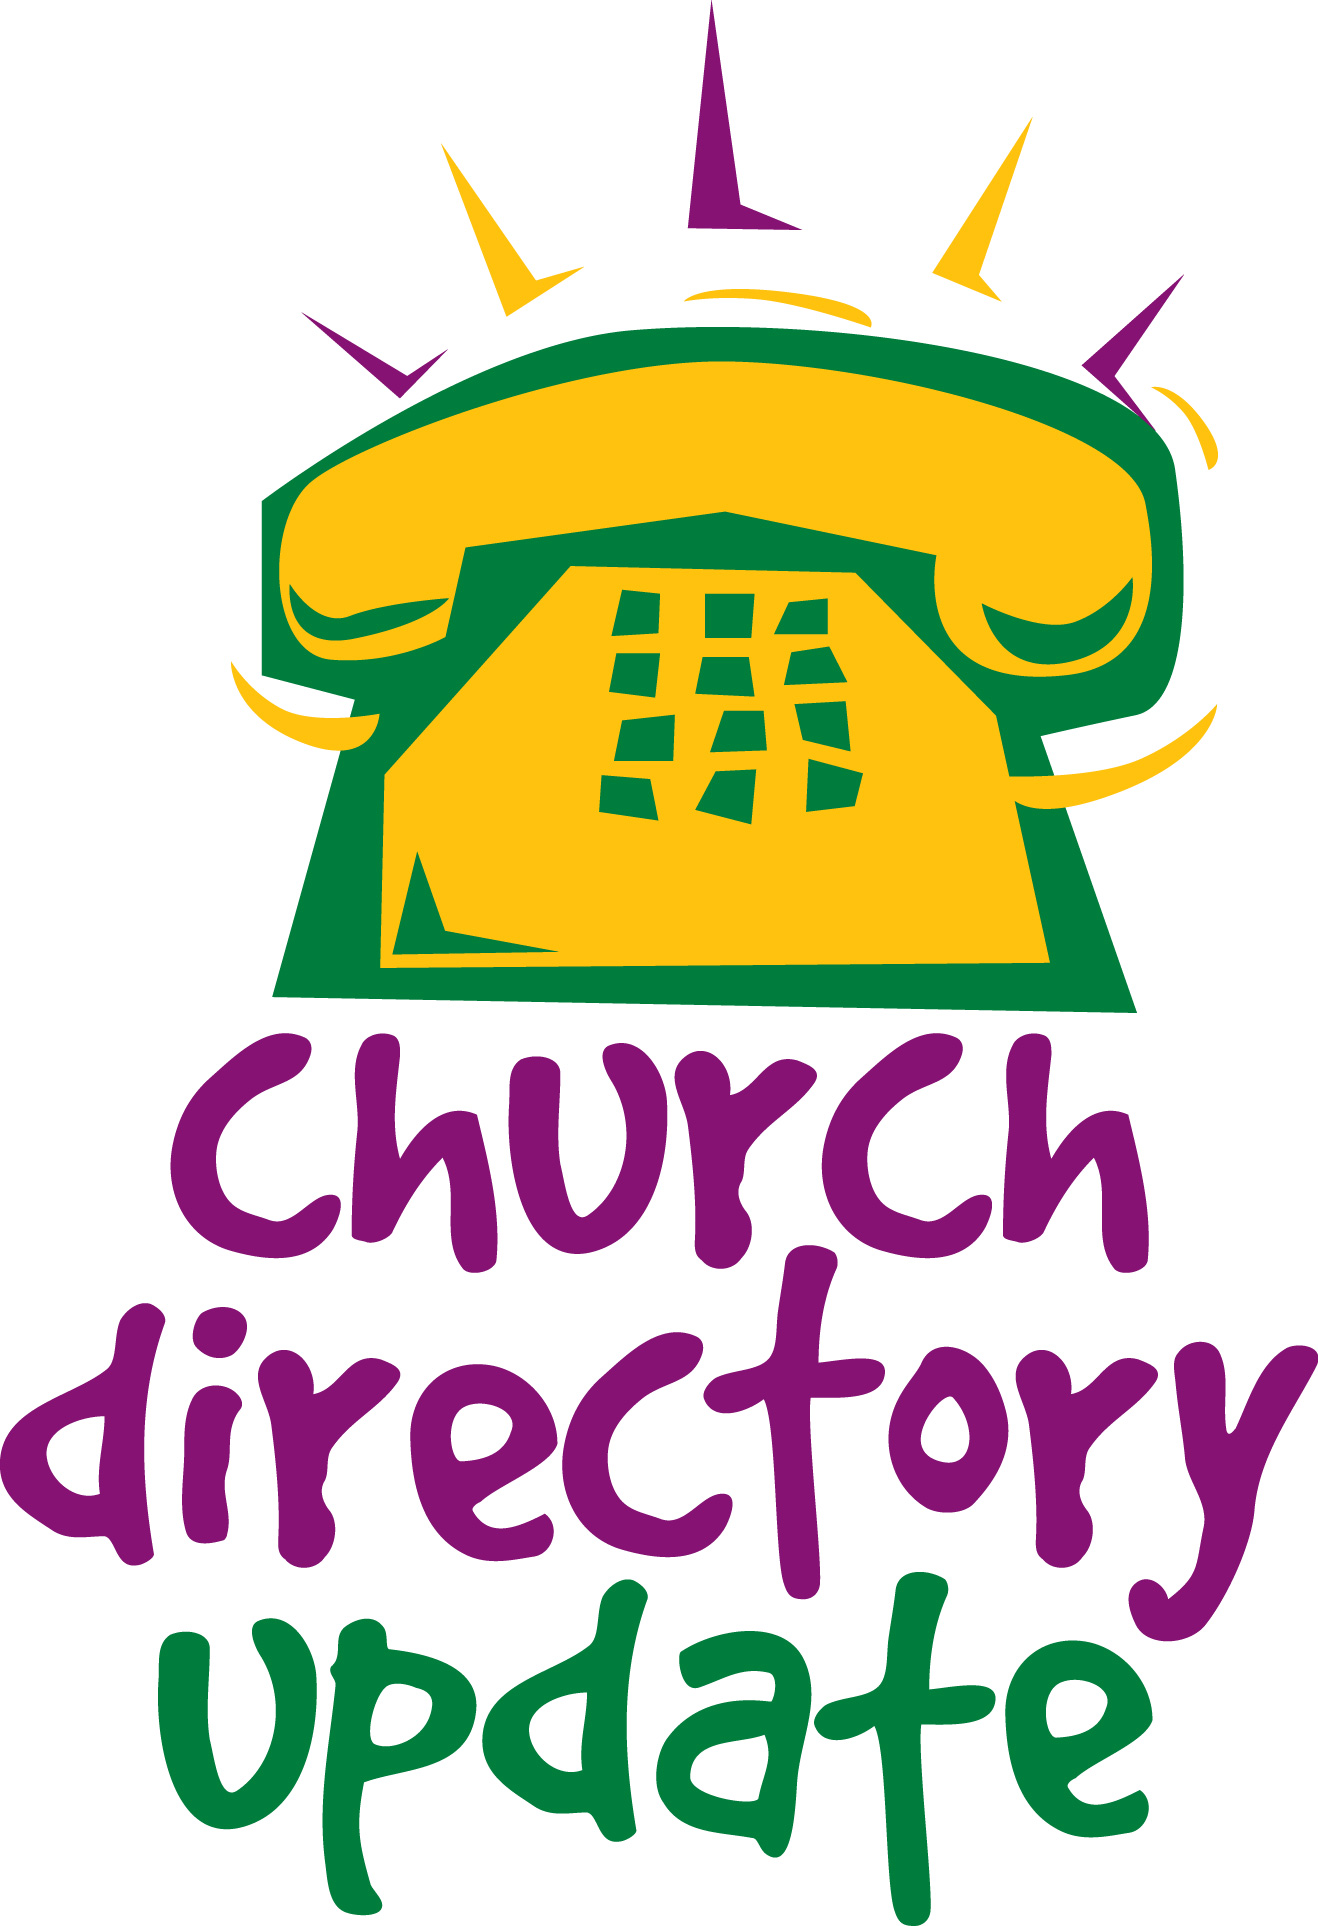 1318x1926 Clip Art Church Address Directory Cliparts